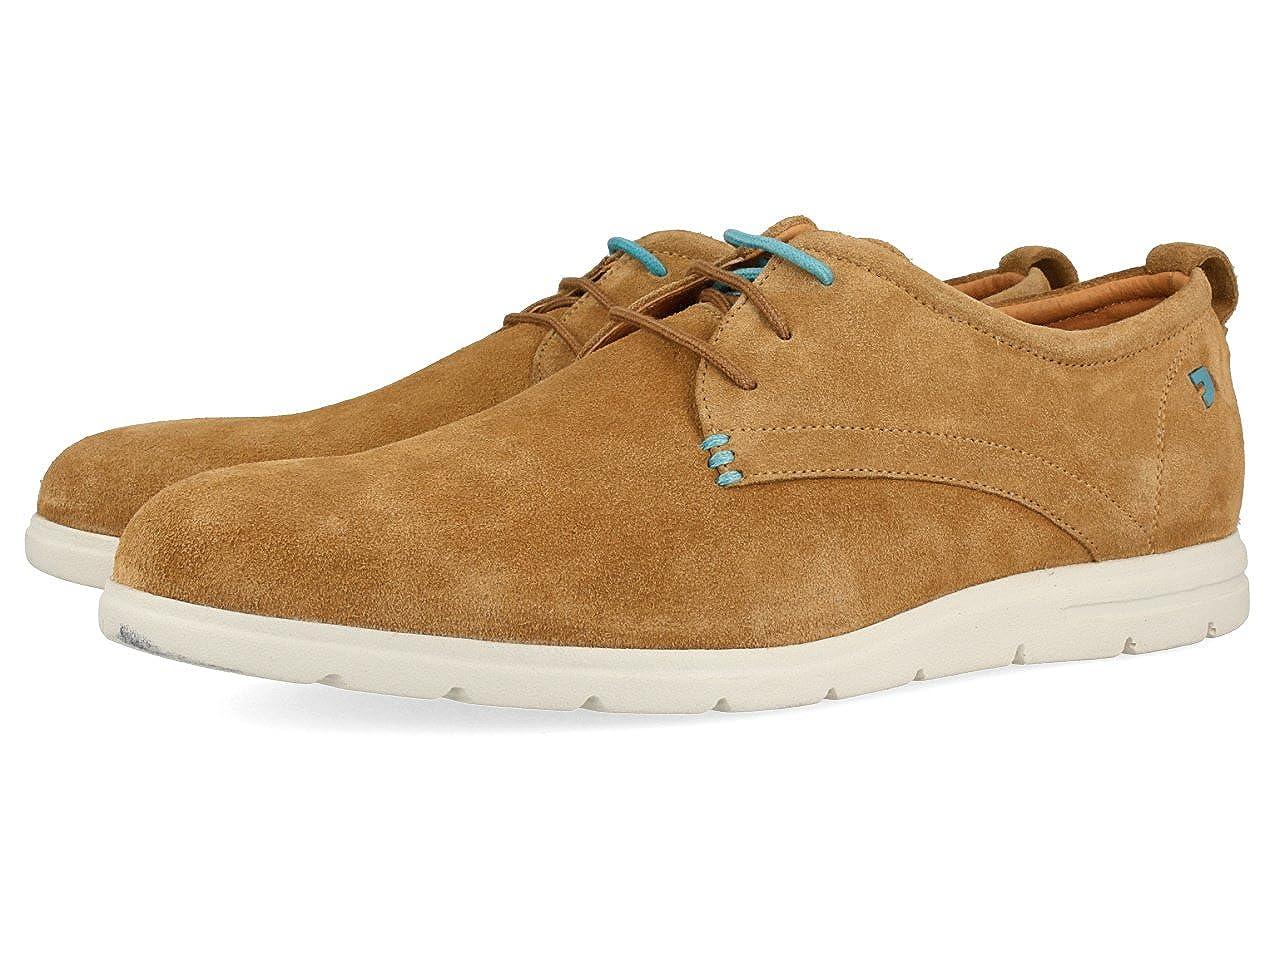 GIOSEPPO 43504, Zapatos de Cordones Derby para Hombre